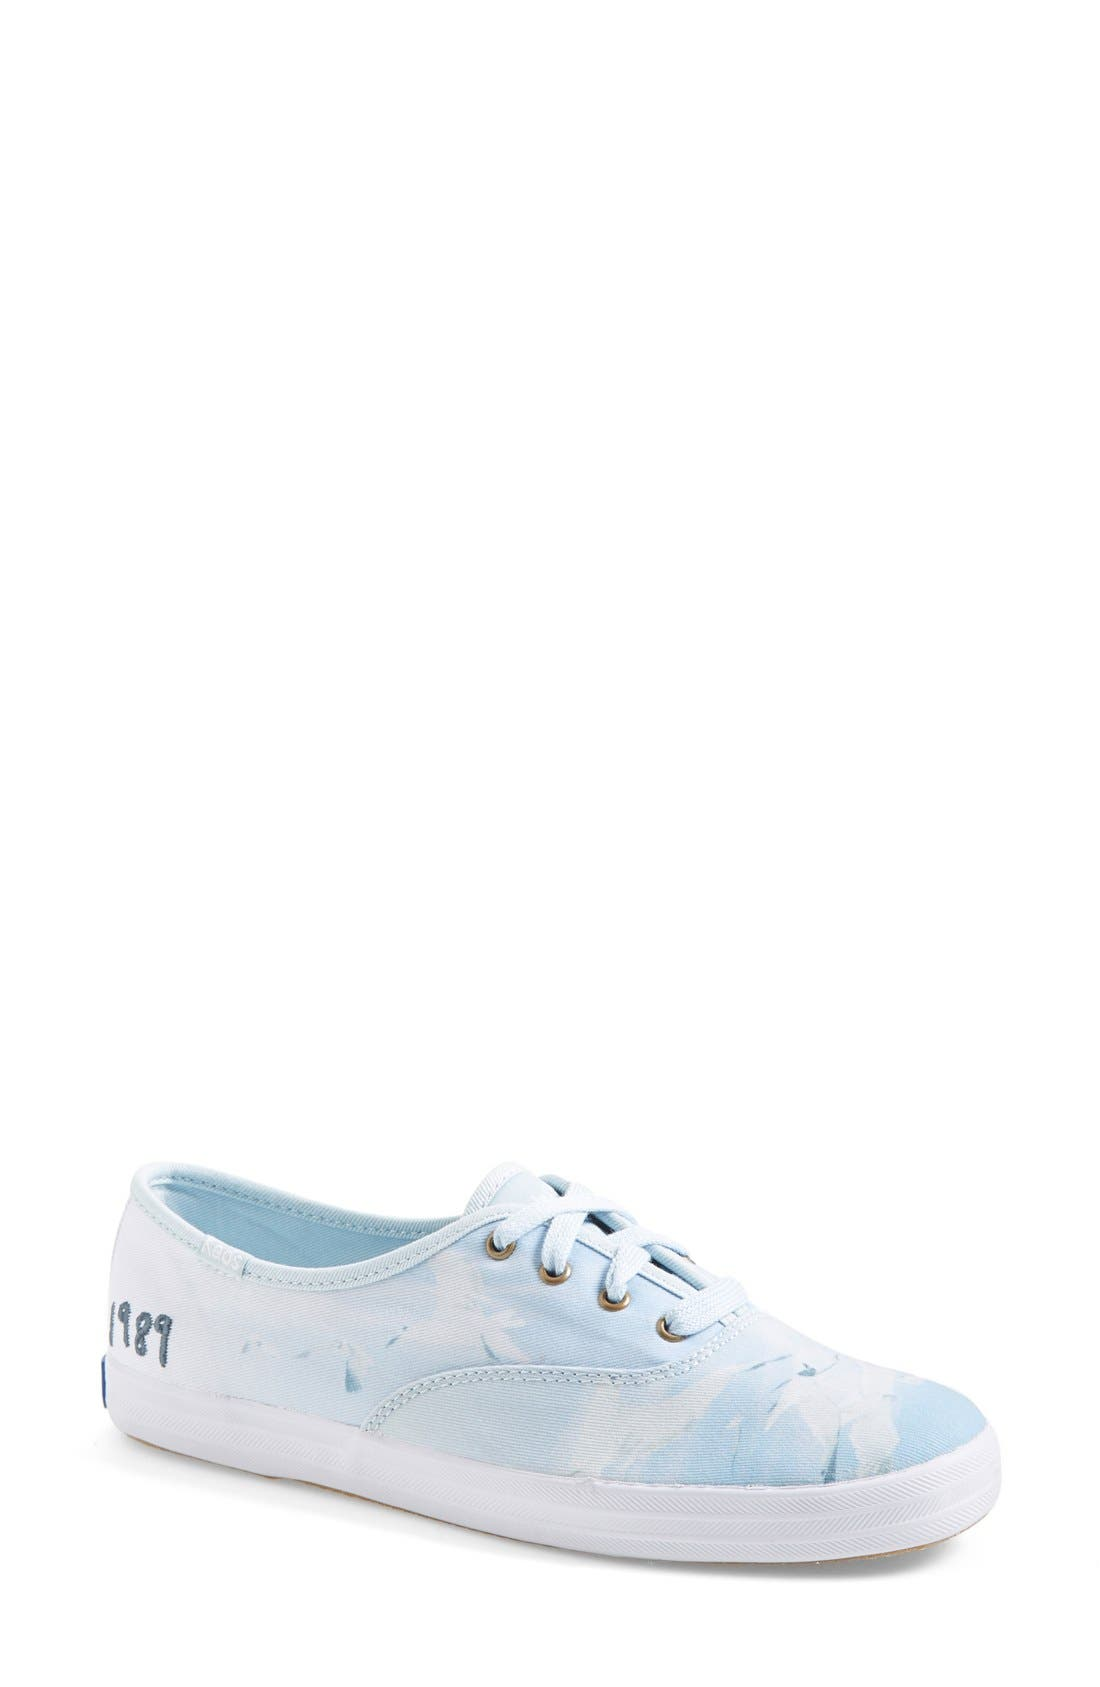 Alternate Image 1 Selected - Keds® Taylor Swift 'Champion -1989' Sneaker (Women)